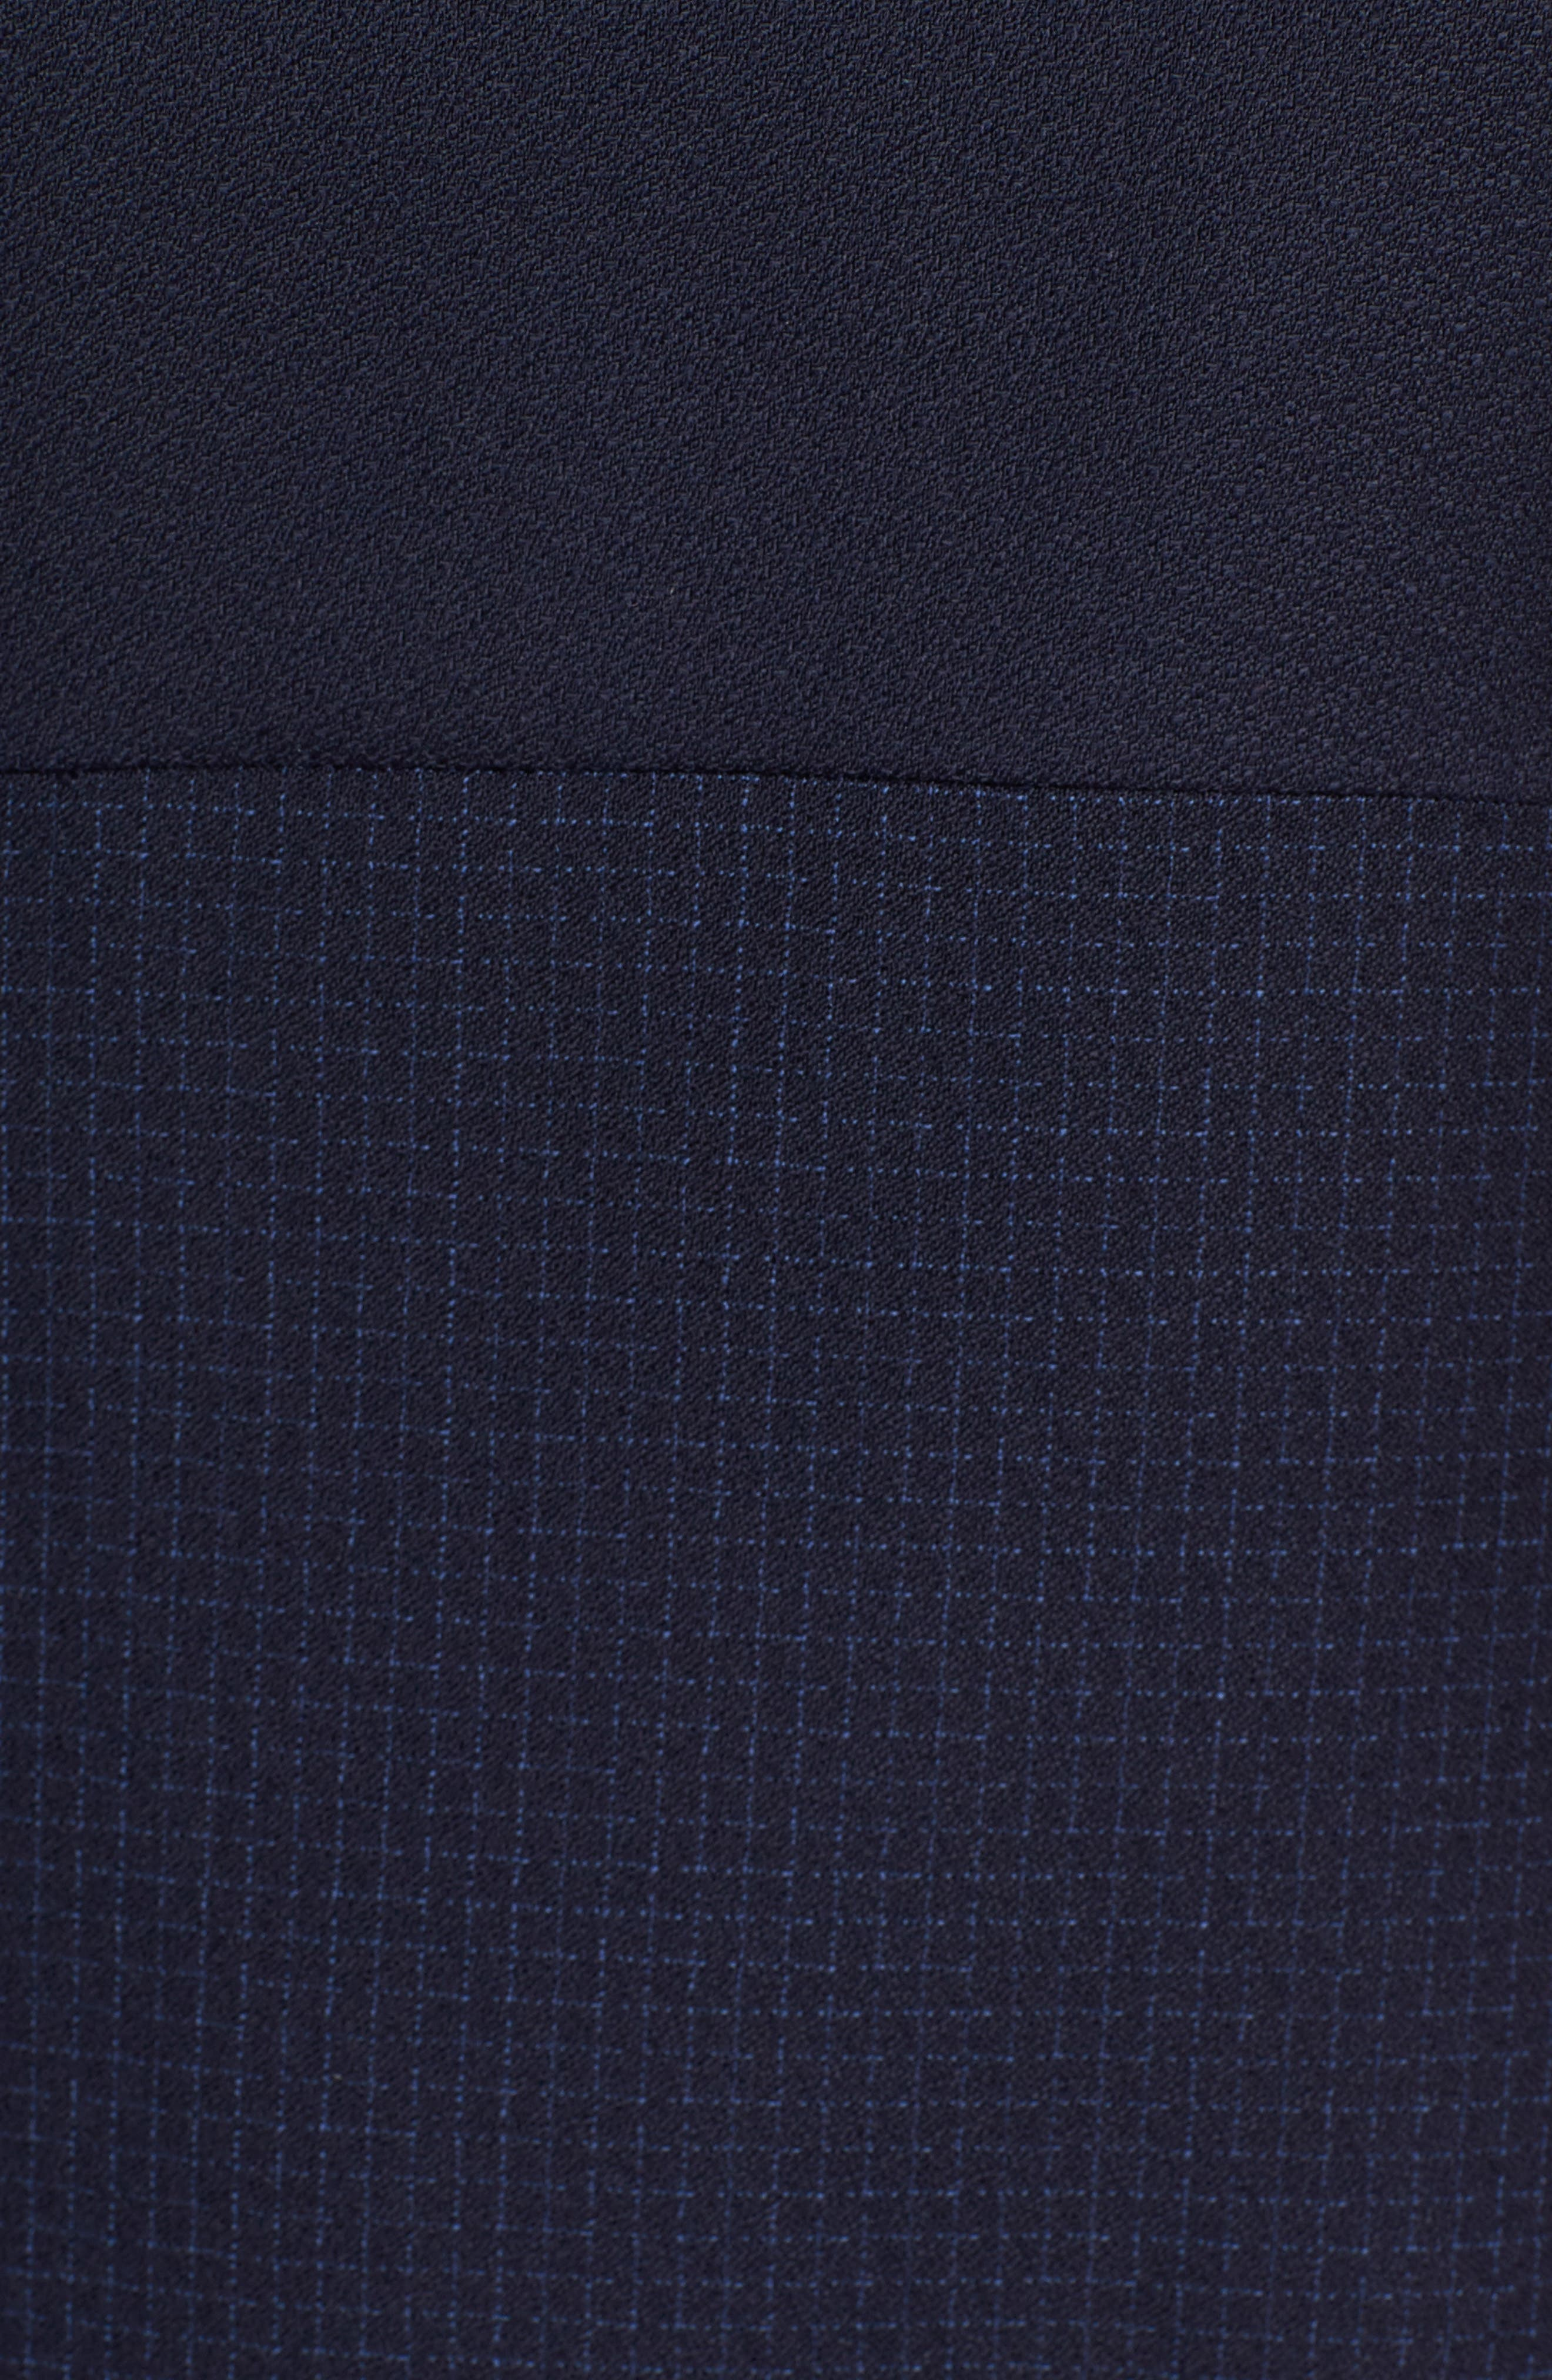 Dibena Windowpane Sheath Dress,                             Alternate thumbnail 6, color,